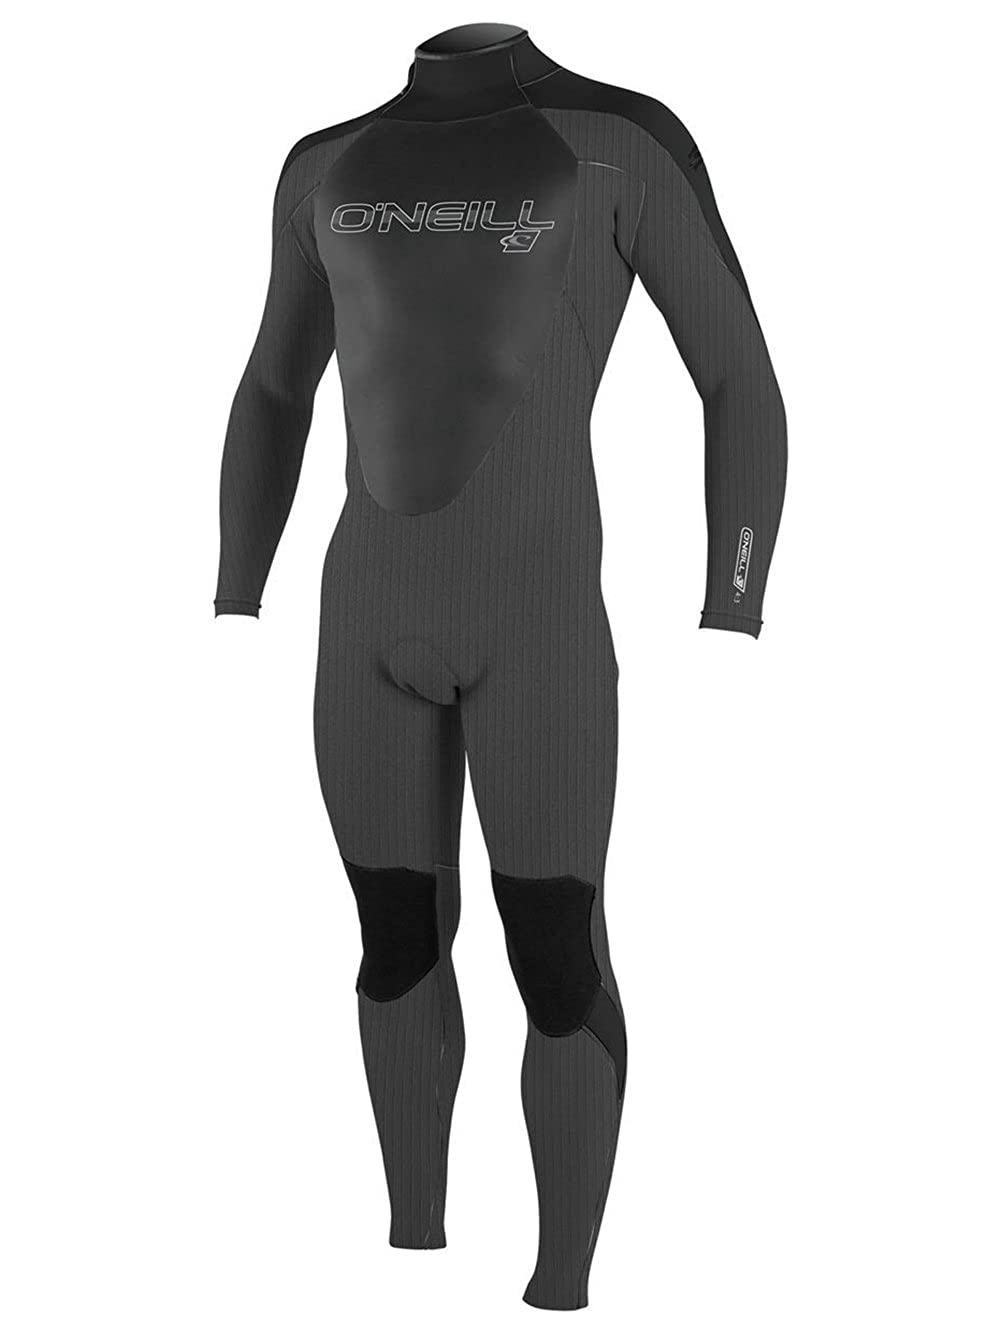 Graphite Graphite Black Large O'Neill Men's Epic 4 3mm Back Zip Full Wetsuit